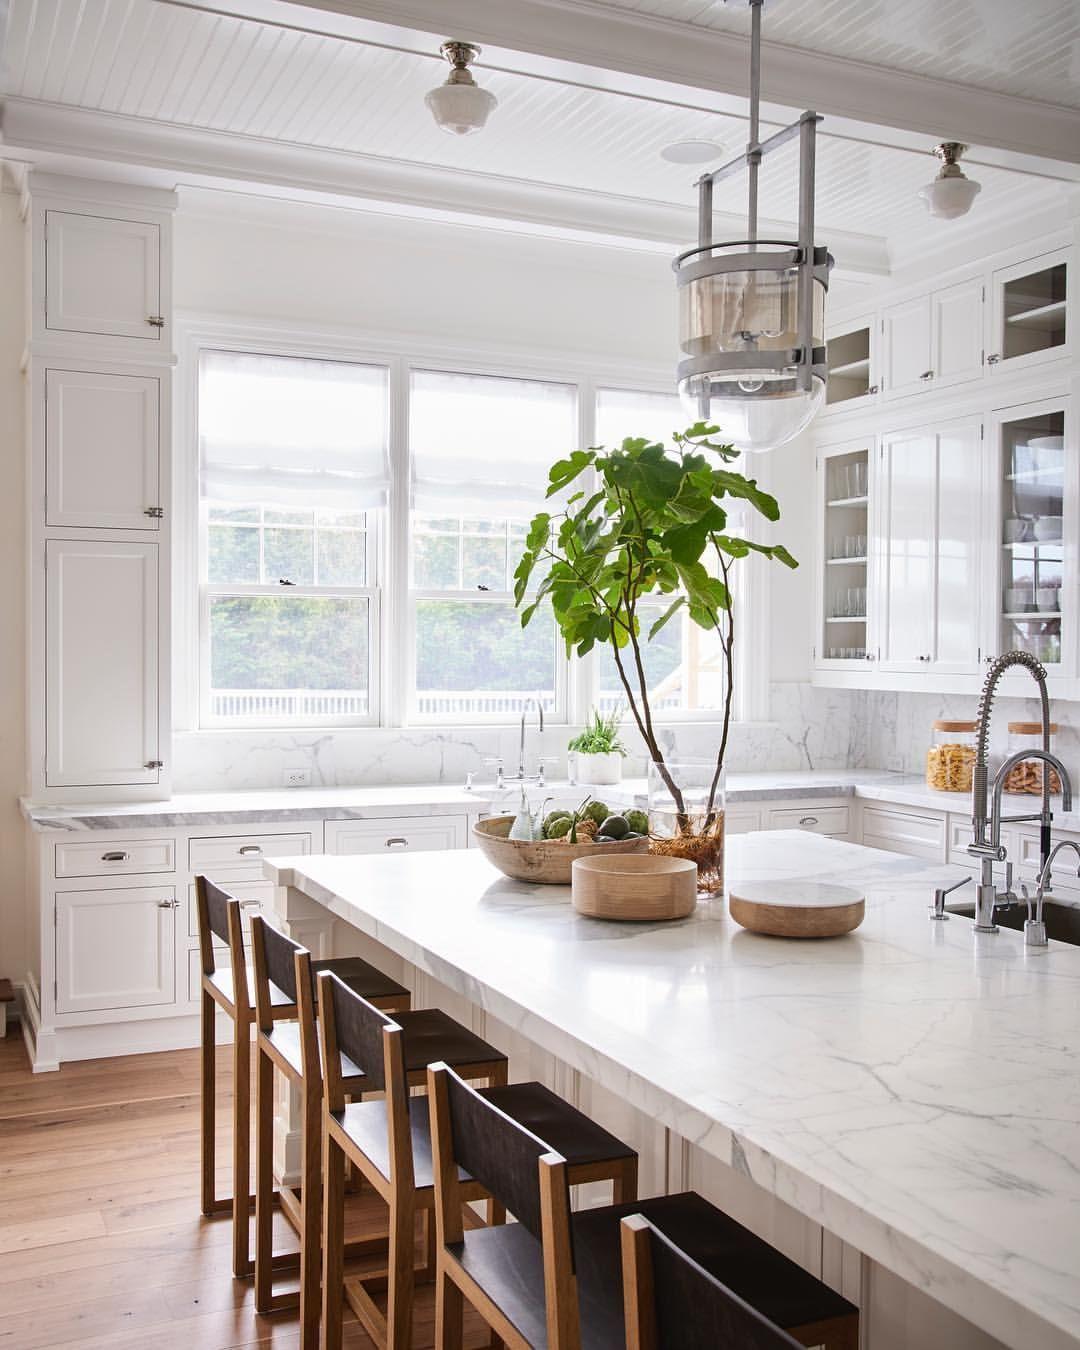 Ordinaire White Hamptons Kitchen #timothygodbold Photo: #alechemeru201d